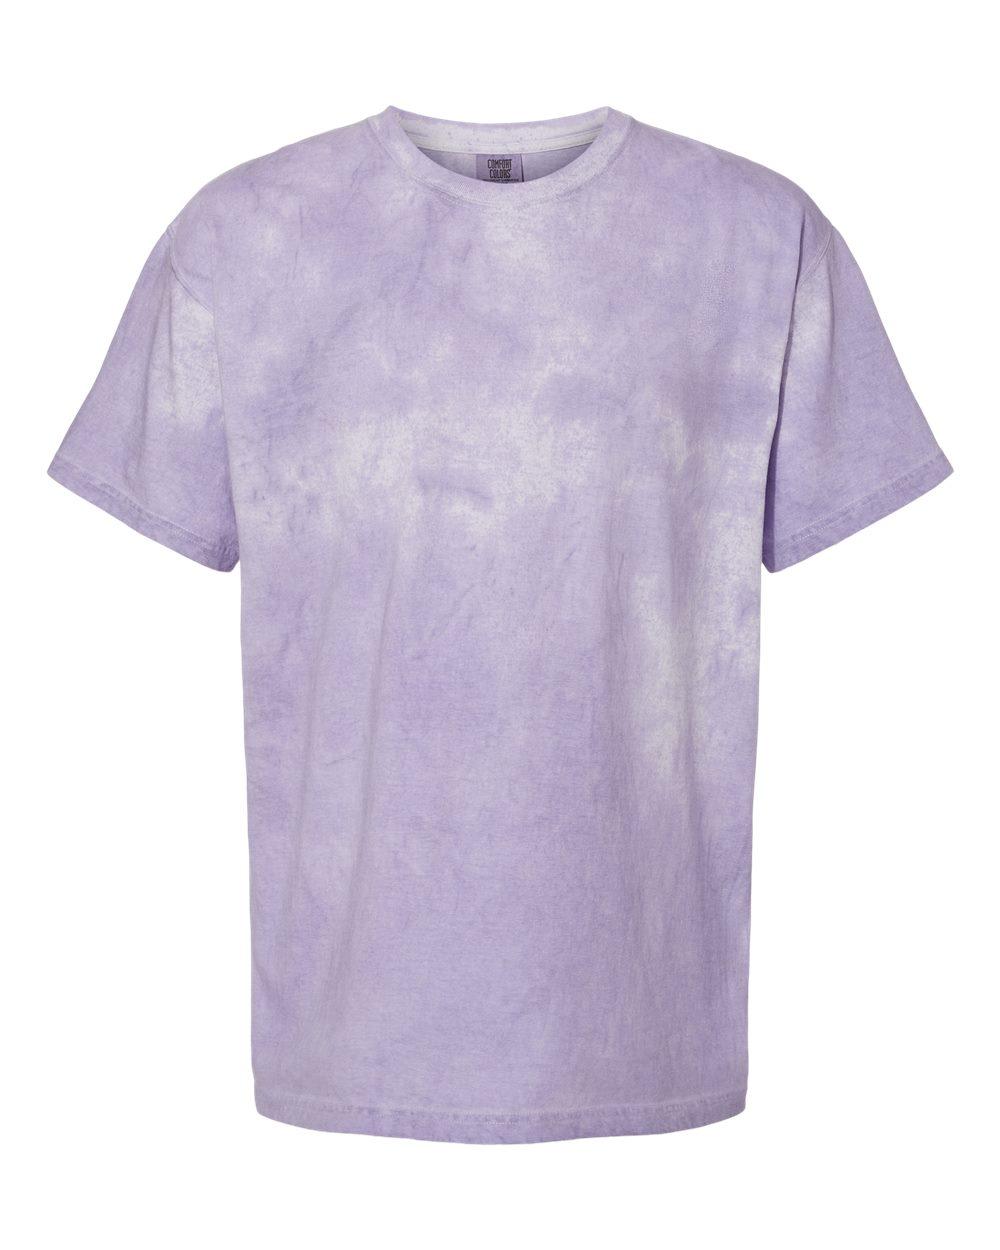 Comfort Colors - 1745 - Colorblast Heavyweight T-Shirt